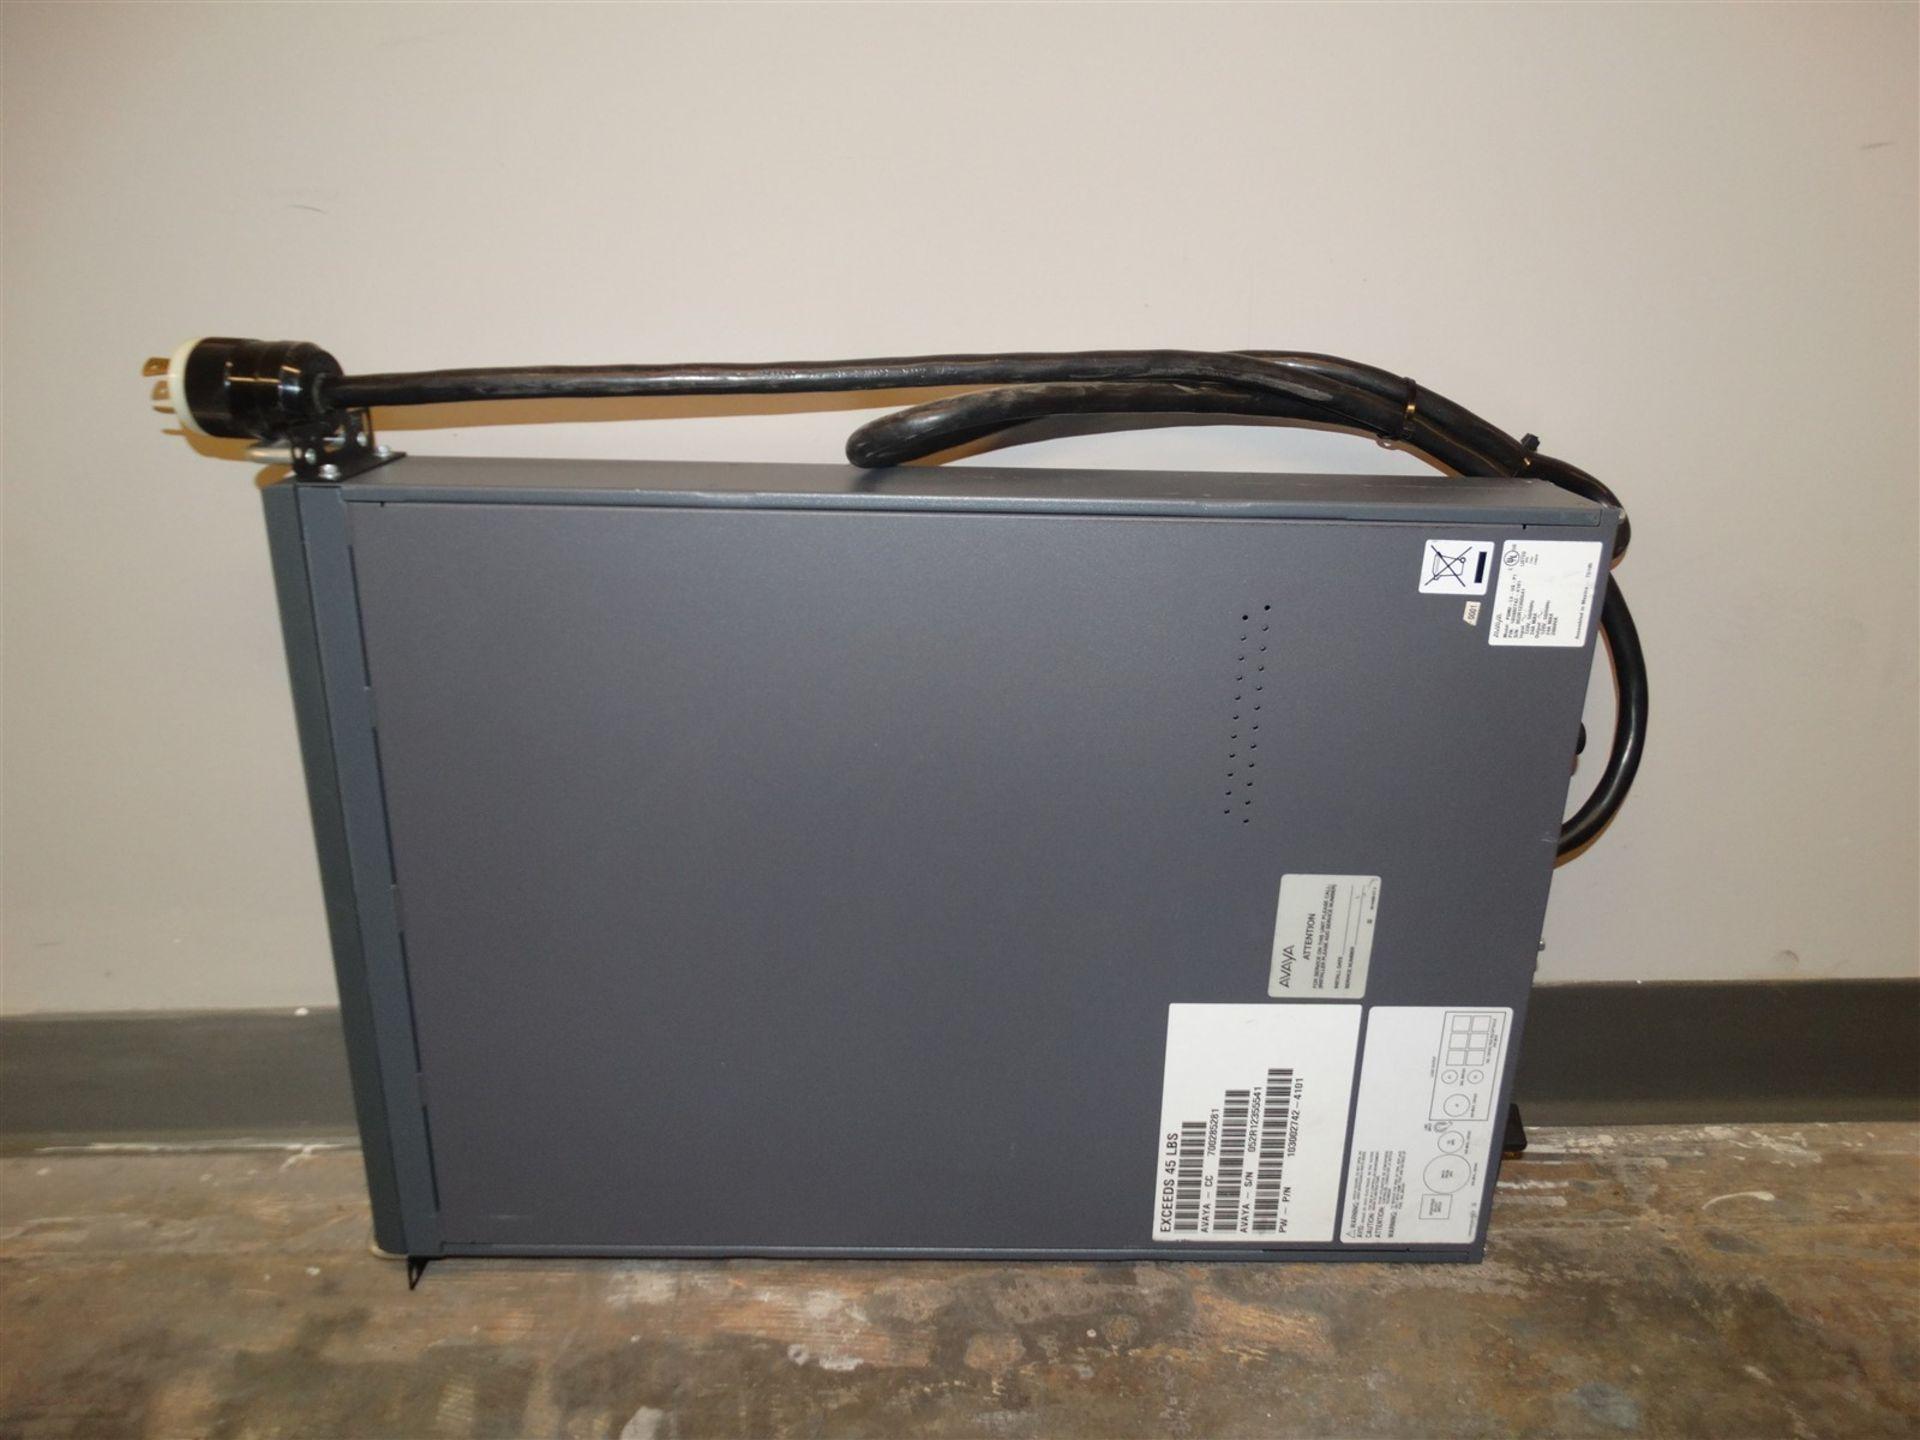 Lot 377 - Avaya Ups Uninterruptible Power Supply PDM2-LV-US-P1 P/N 103002742-4101 120V 24A SKU: 20660